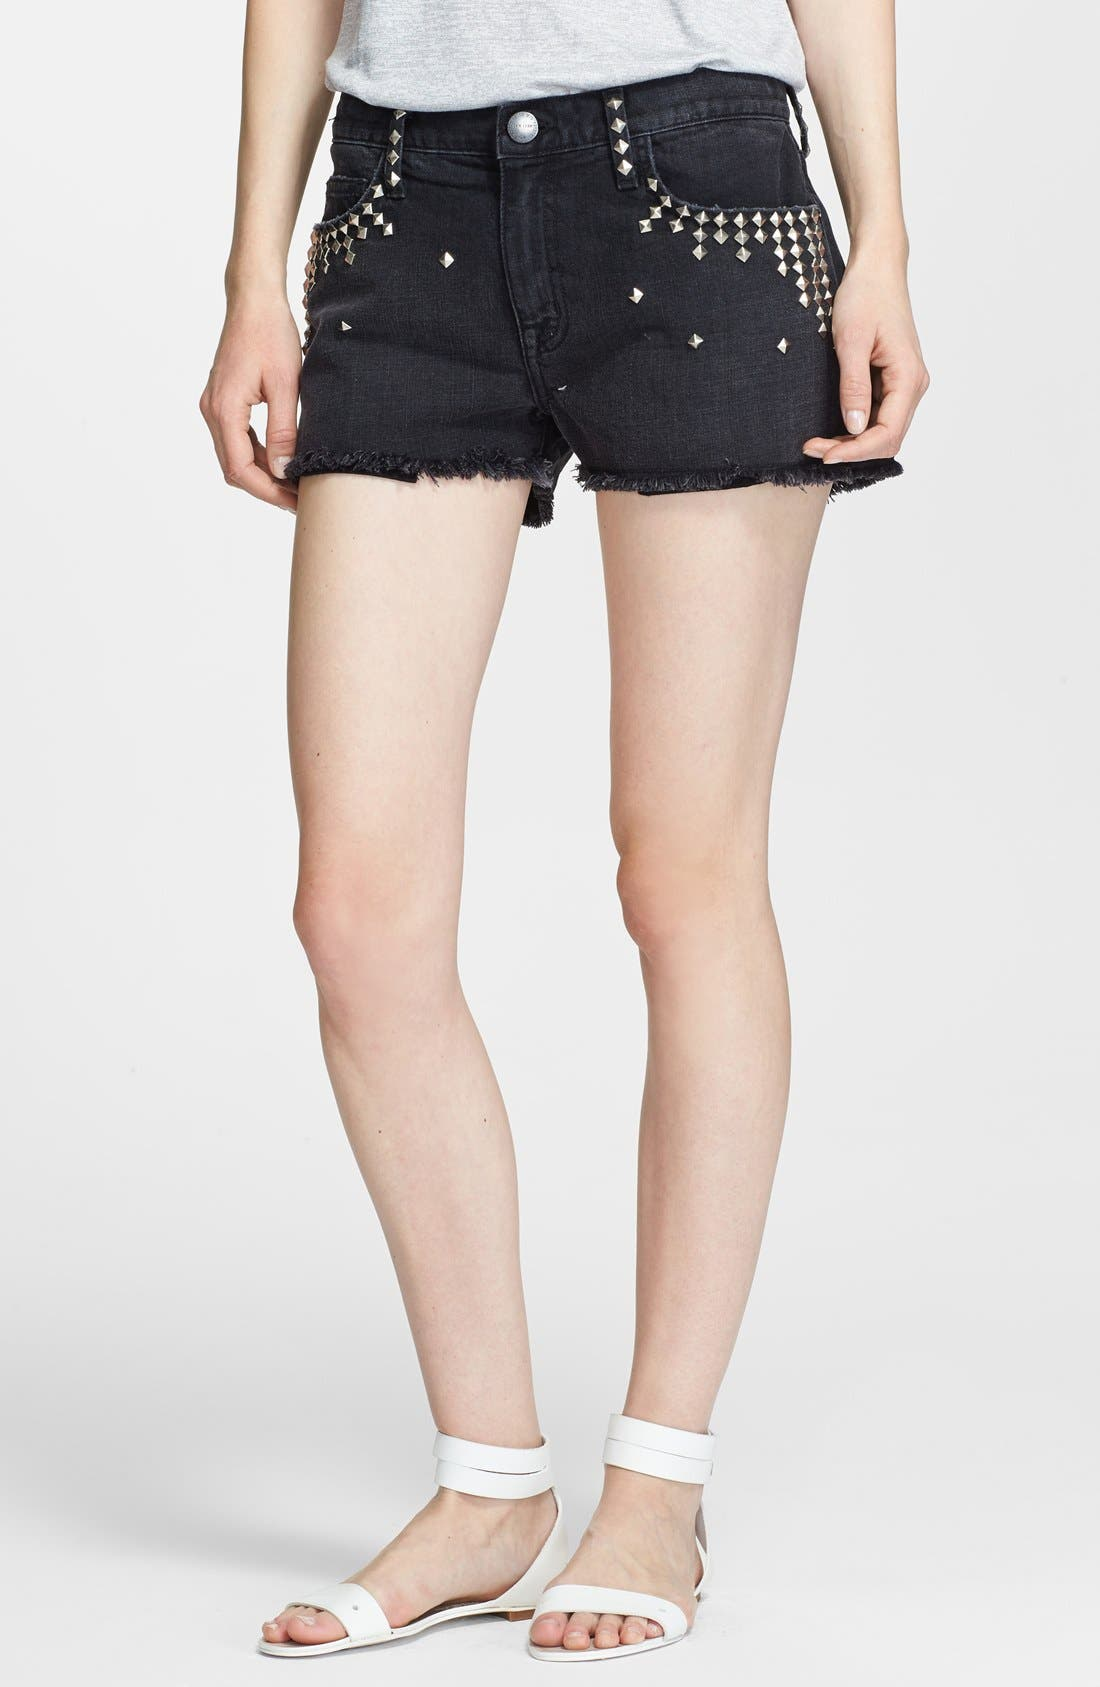 Alternate Image 1 Selected - Current/Elliott 'The Boyfriend' Studded Shorts